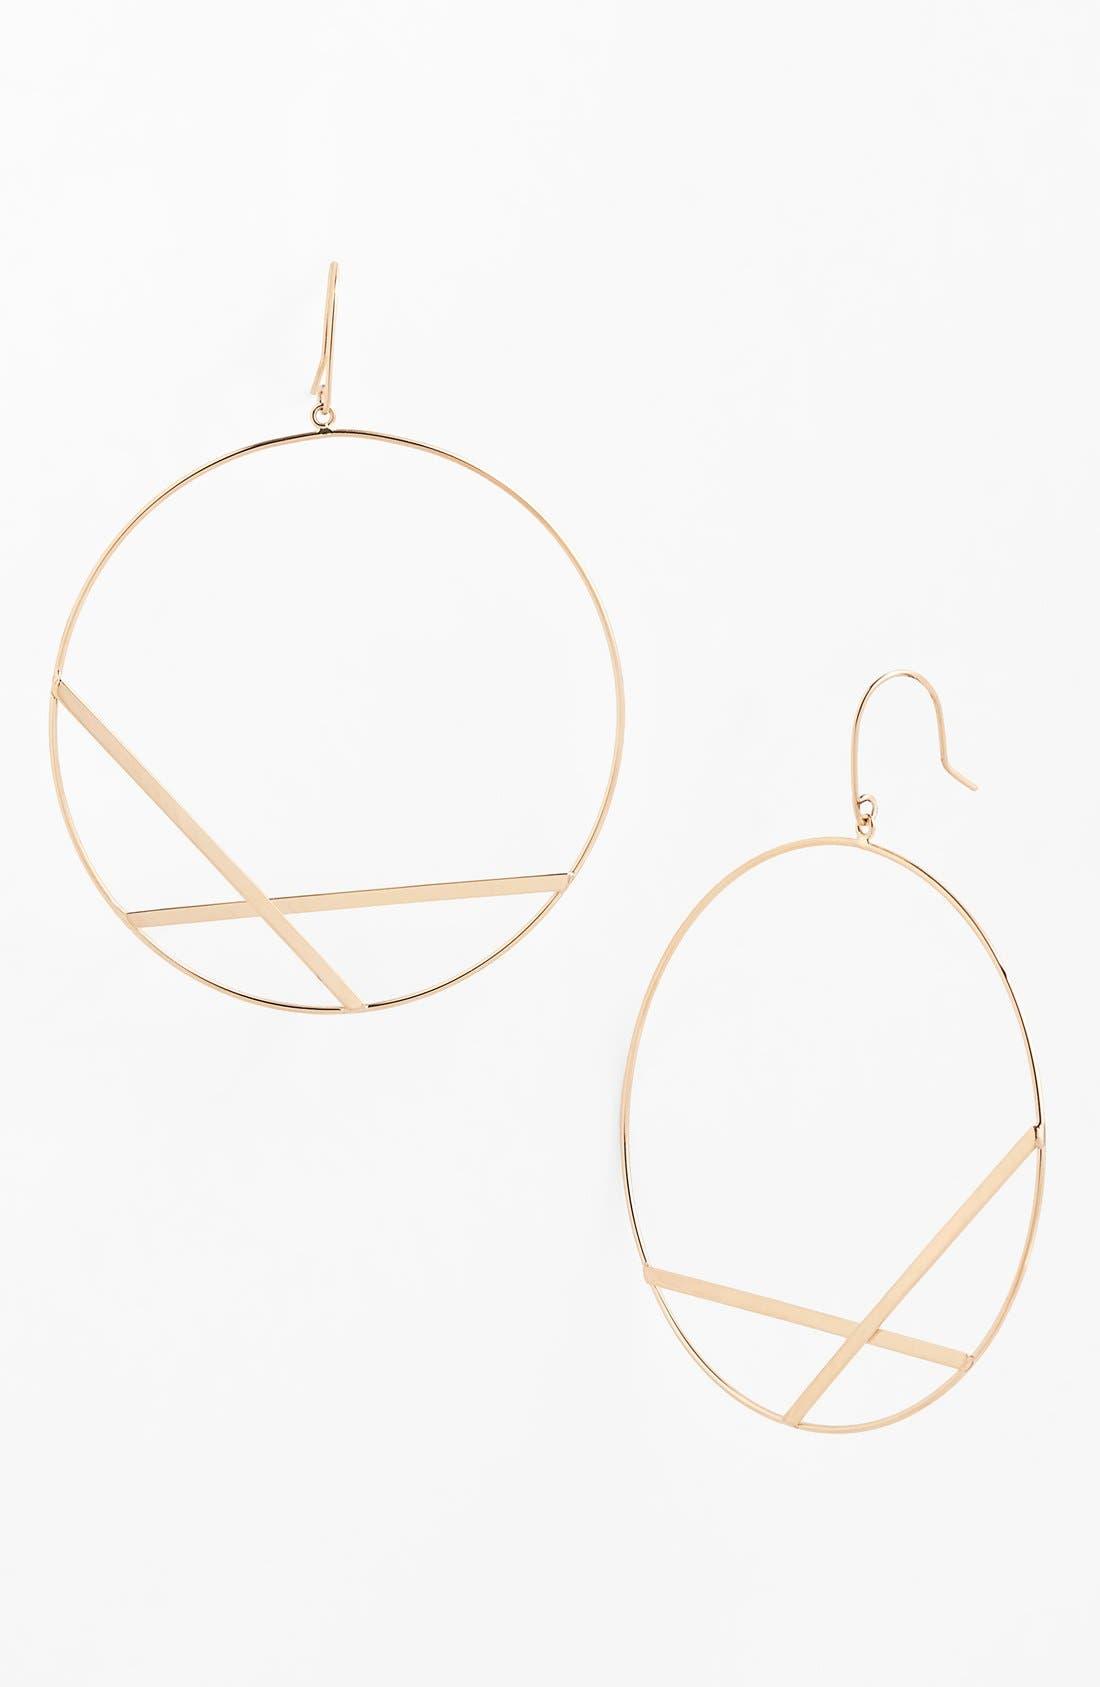 Main Image - Lana Jewelry 'Affinity' Large Drop Hoop Earrings